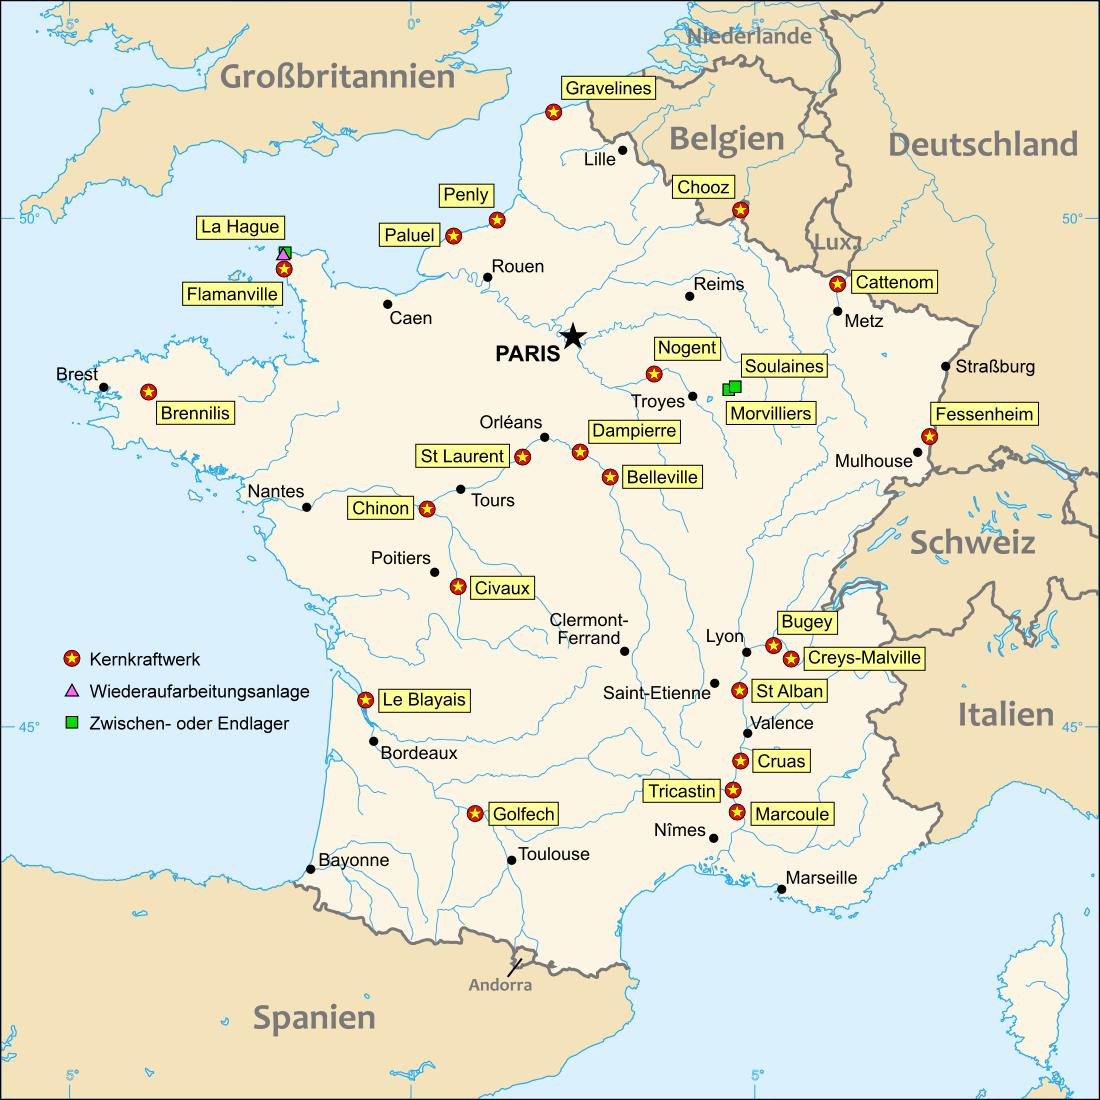 Landkarte Niederlande (Touristische Karte) : mylogomaker.de